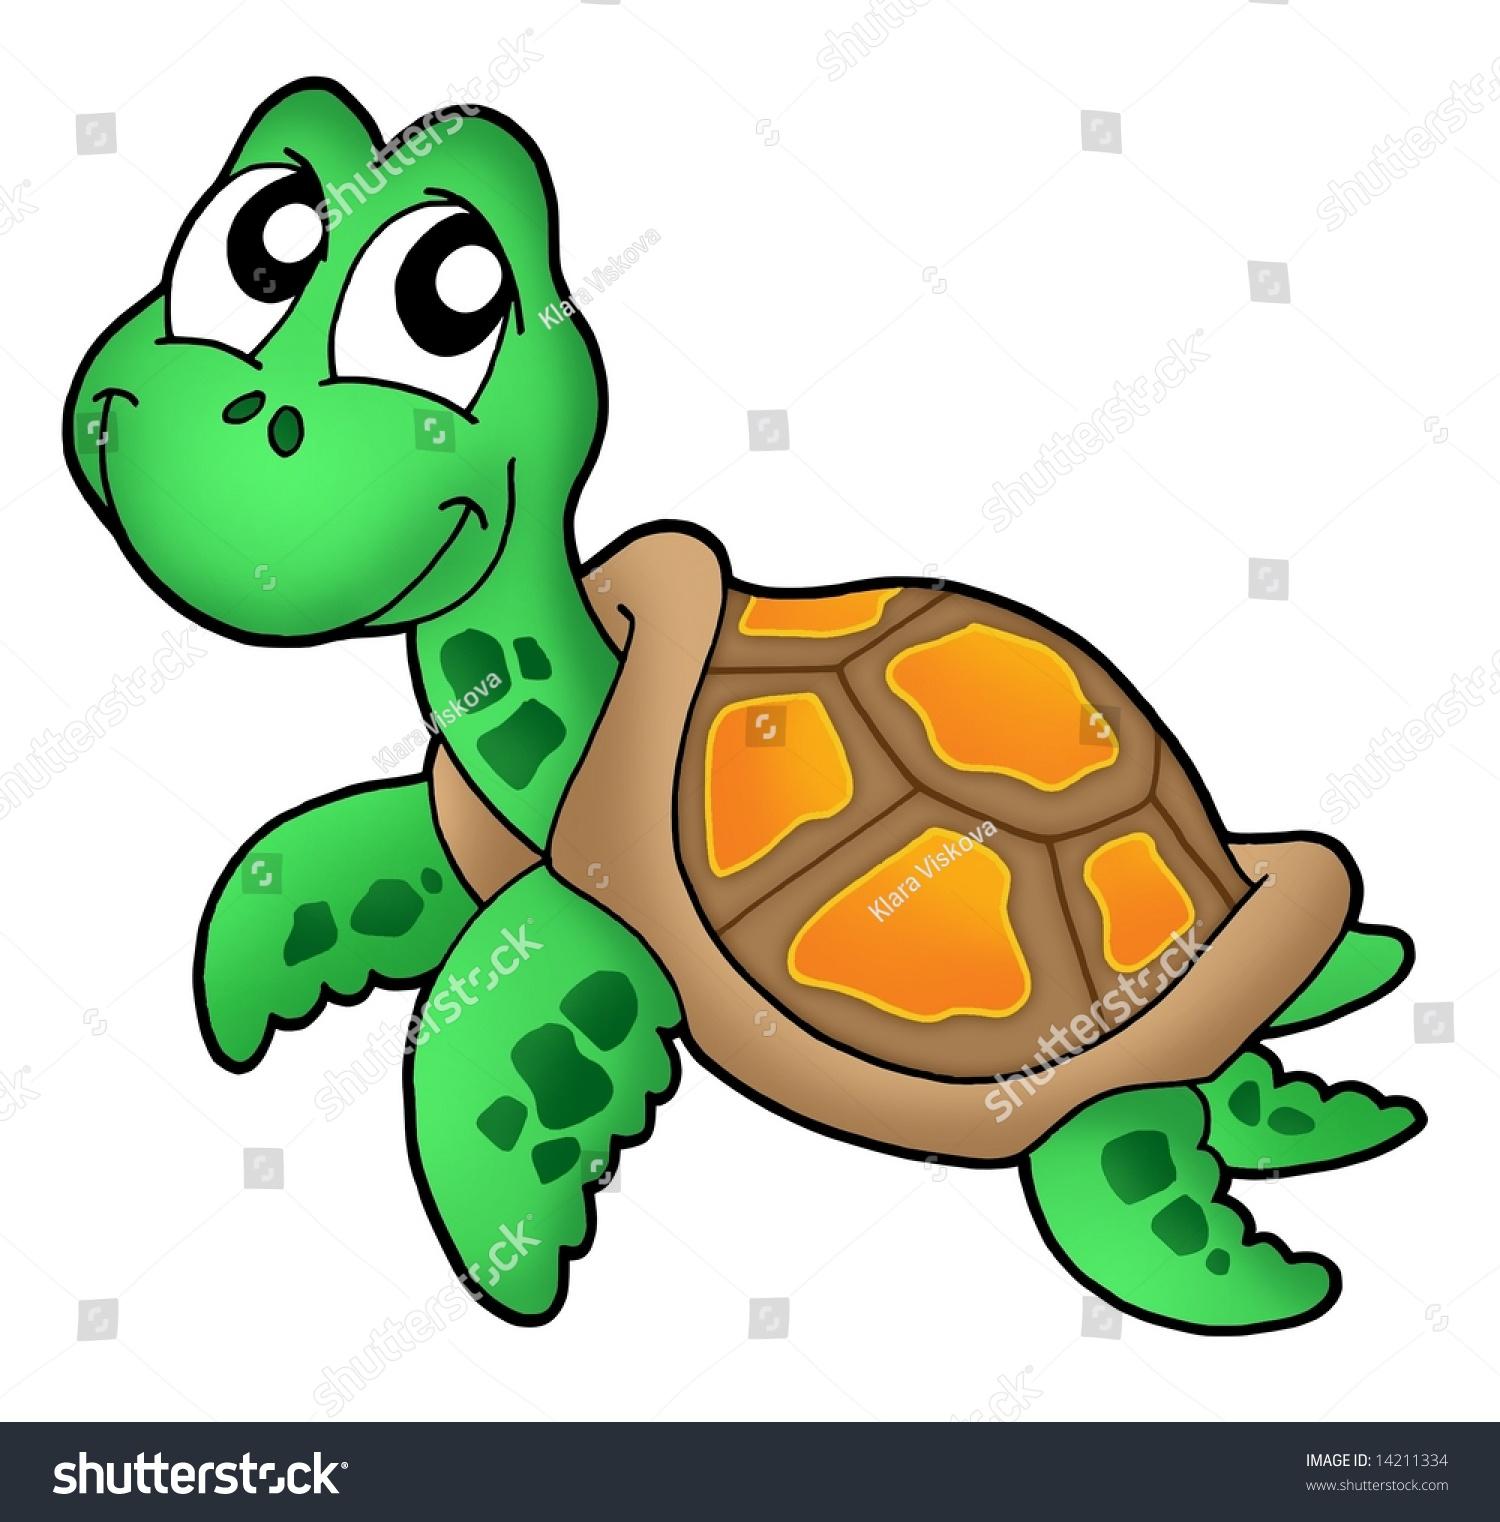 Little Sea Turtle Color Illustration Stock Illustration 14211334 ...